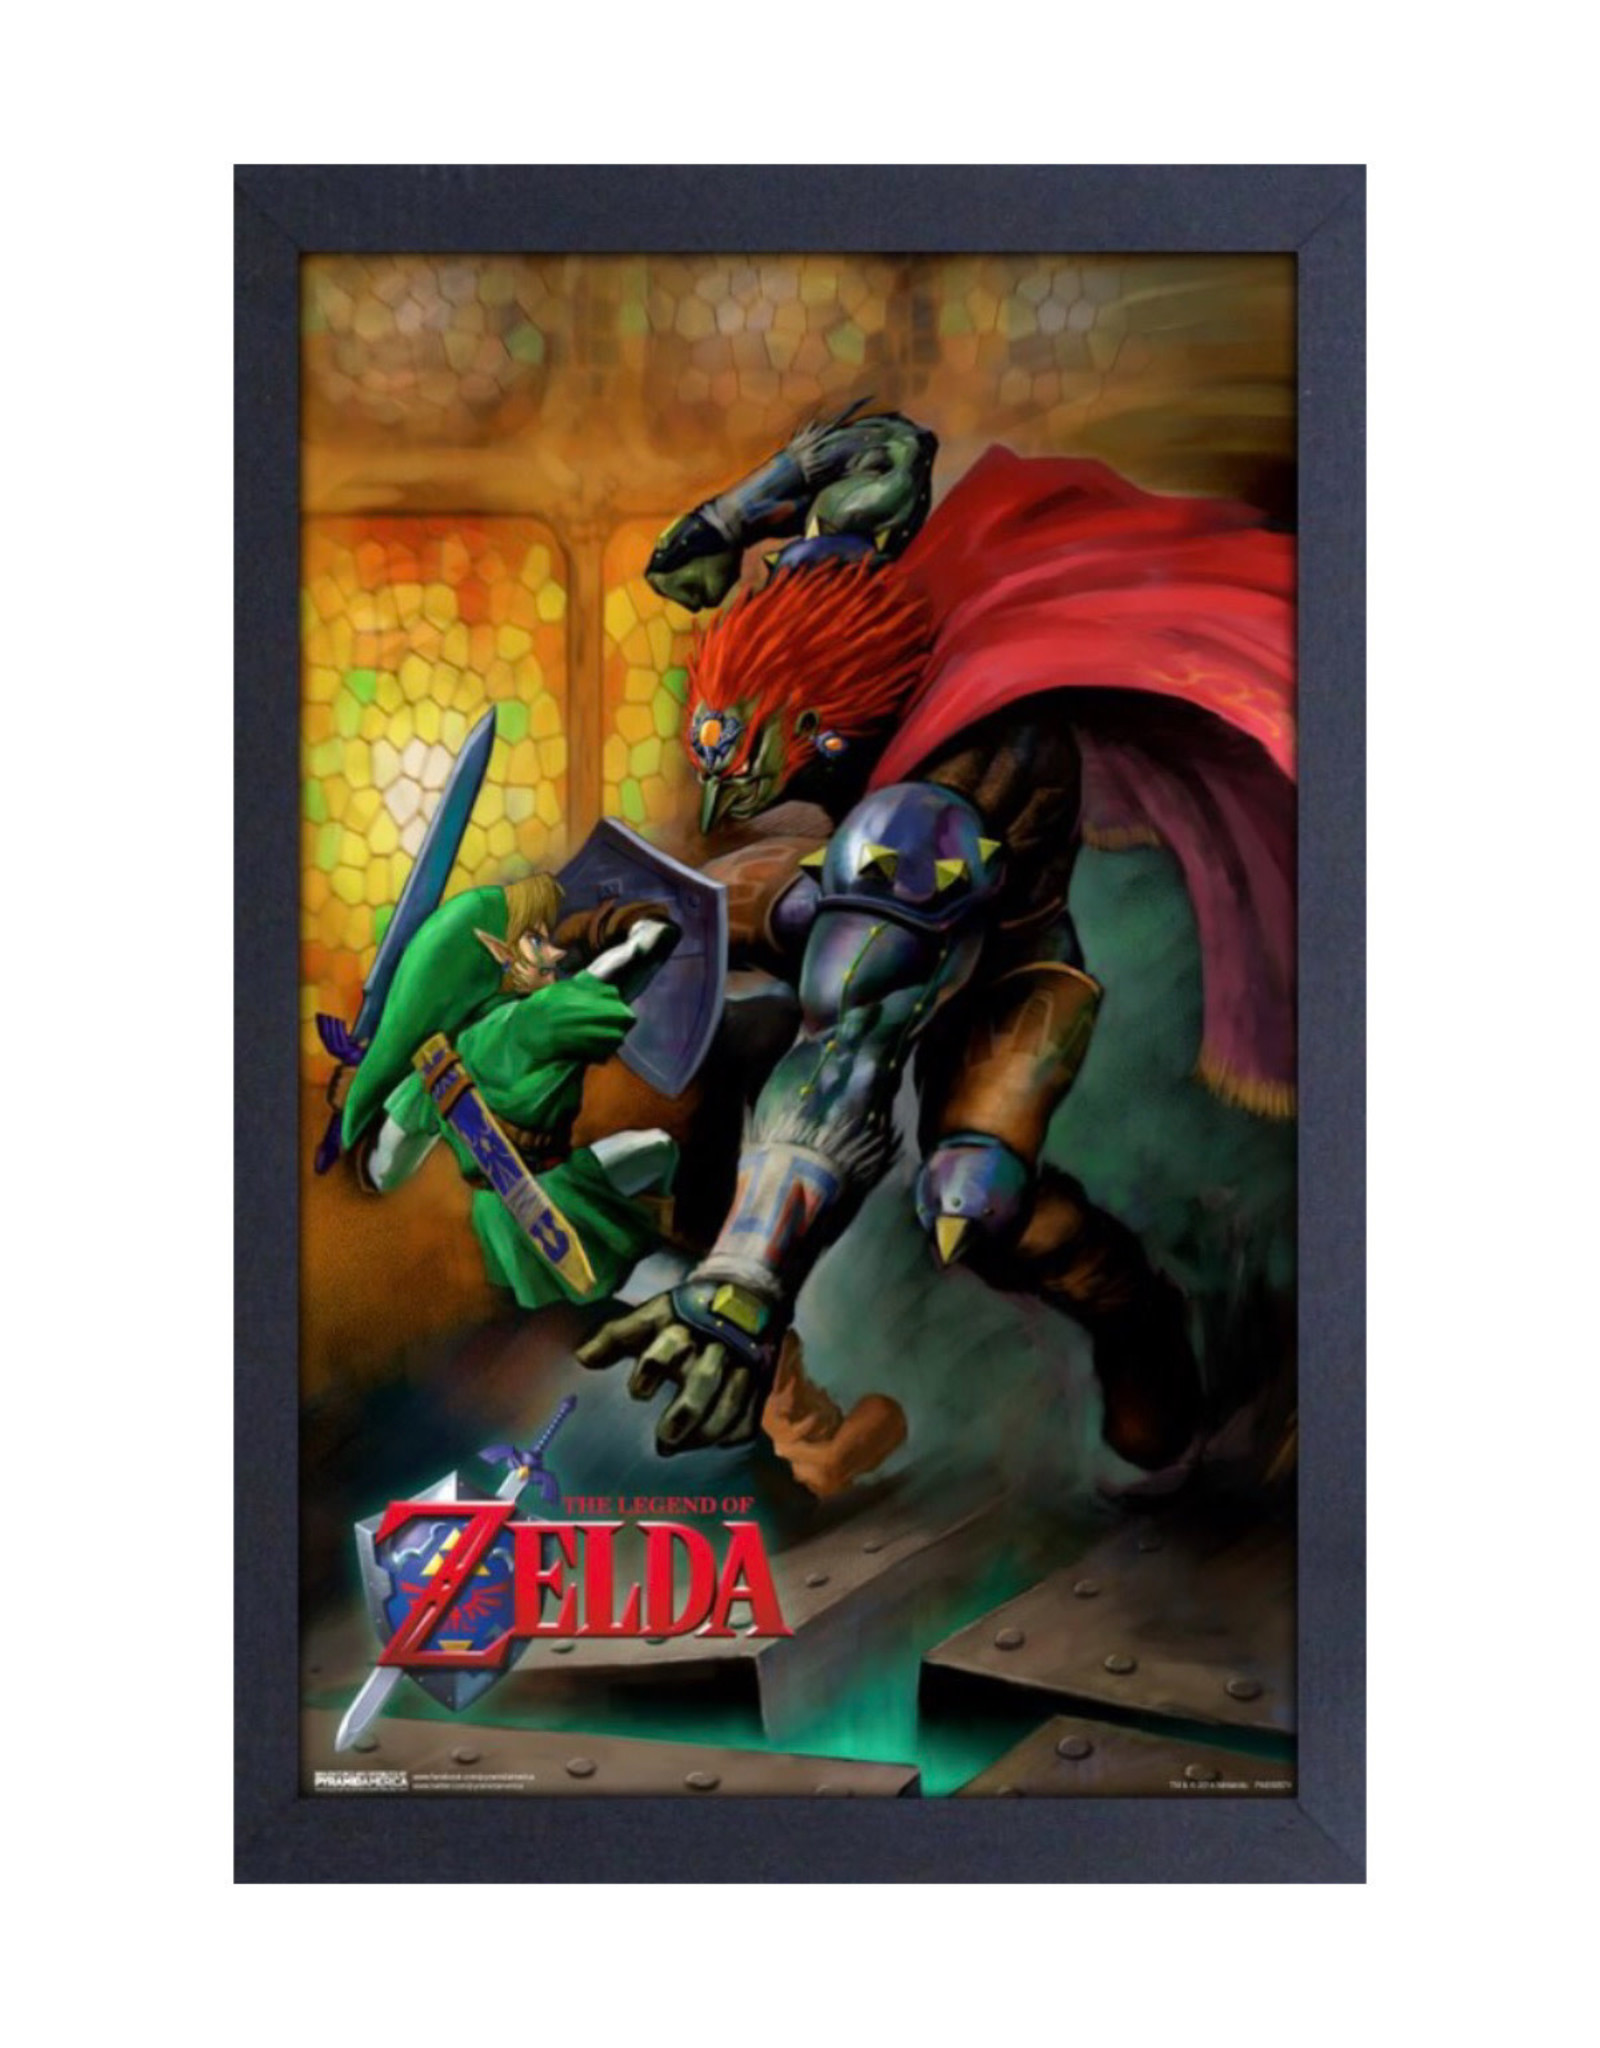 Zelda ( Framed print ) Link s. Ganondorf